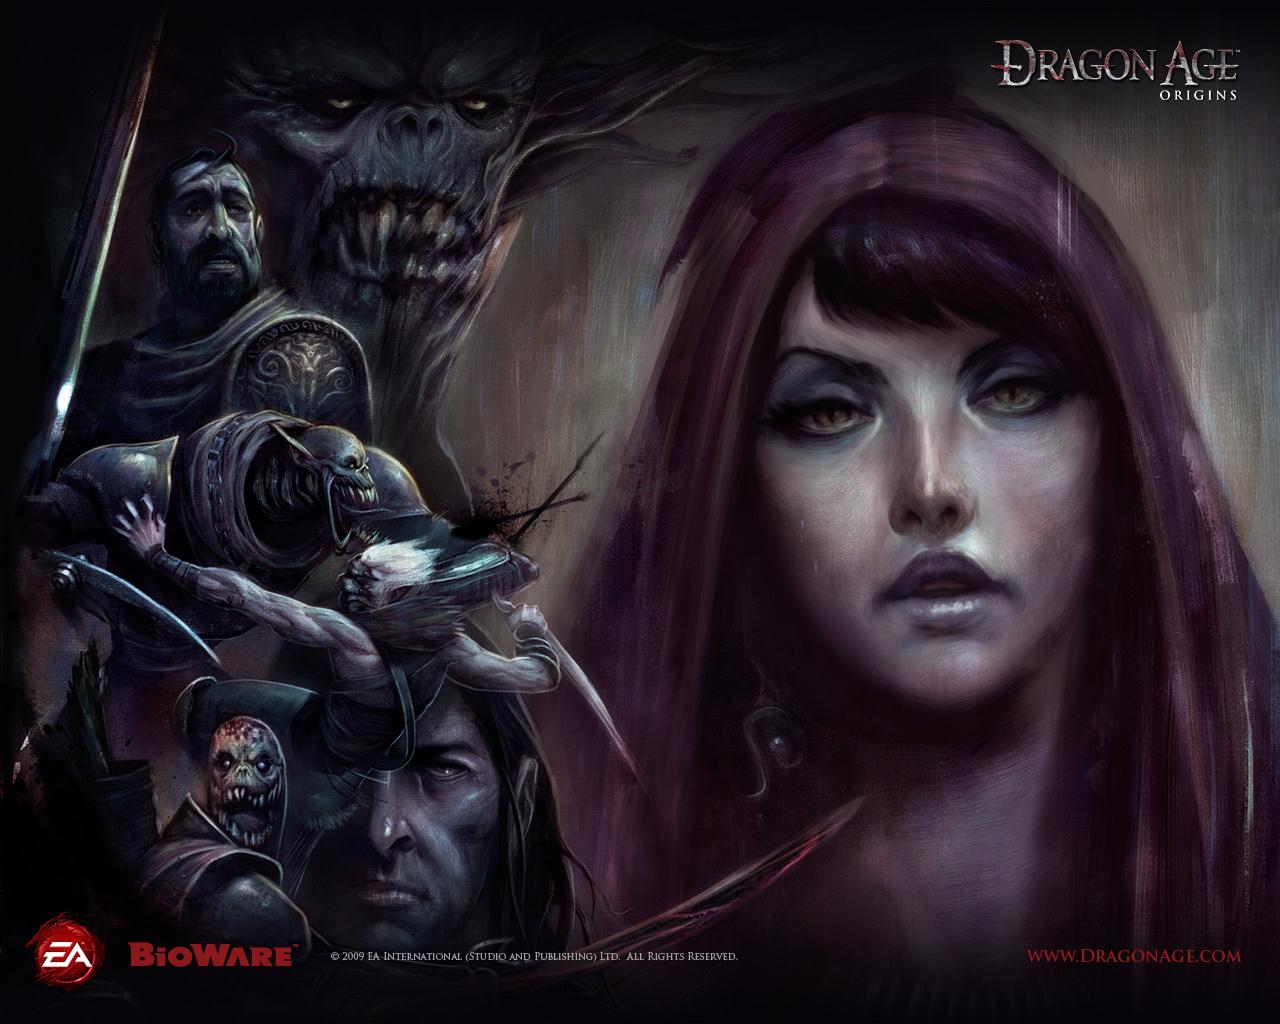 Dragon Age Origins Images Dragon Age Origins Hd Wallpaper And